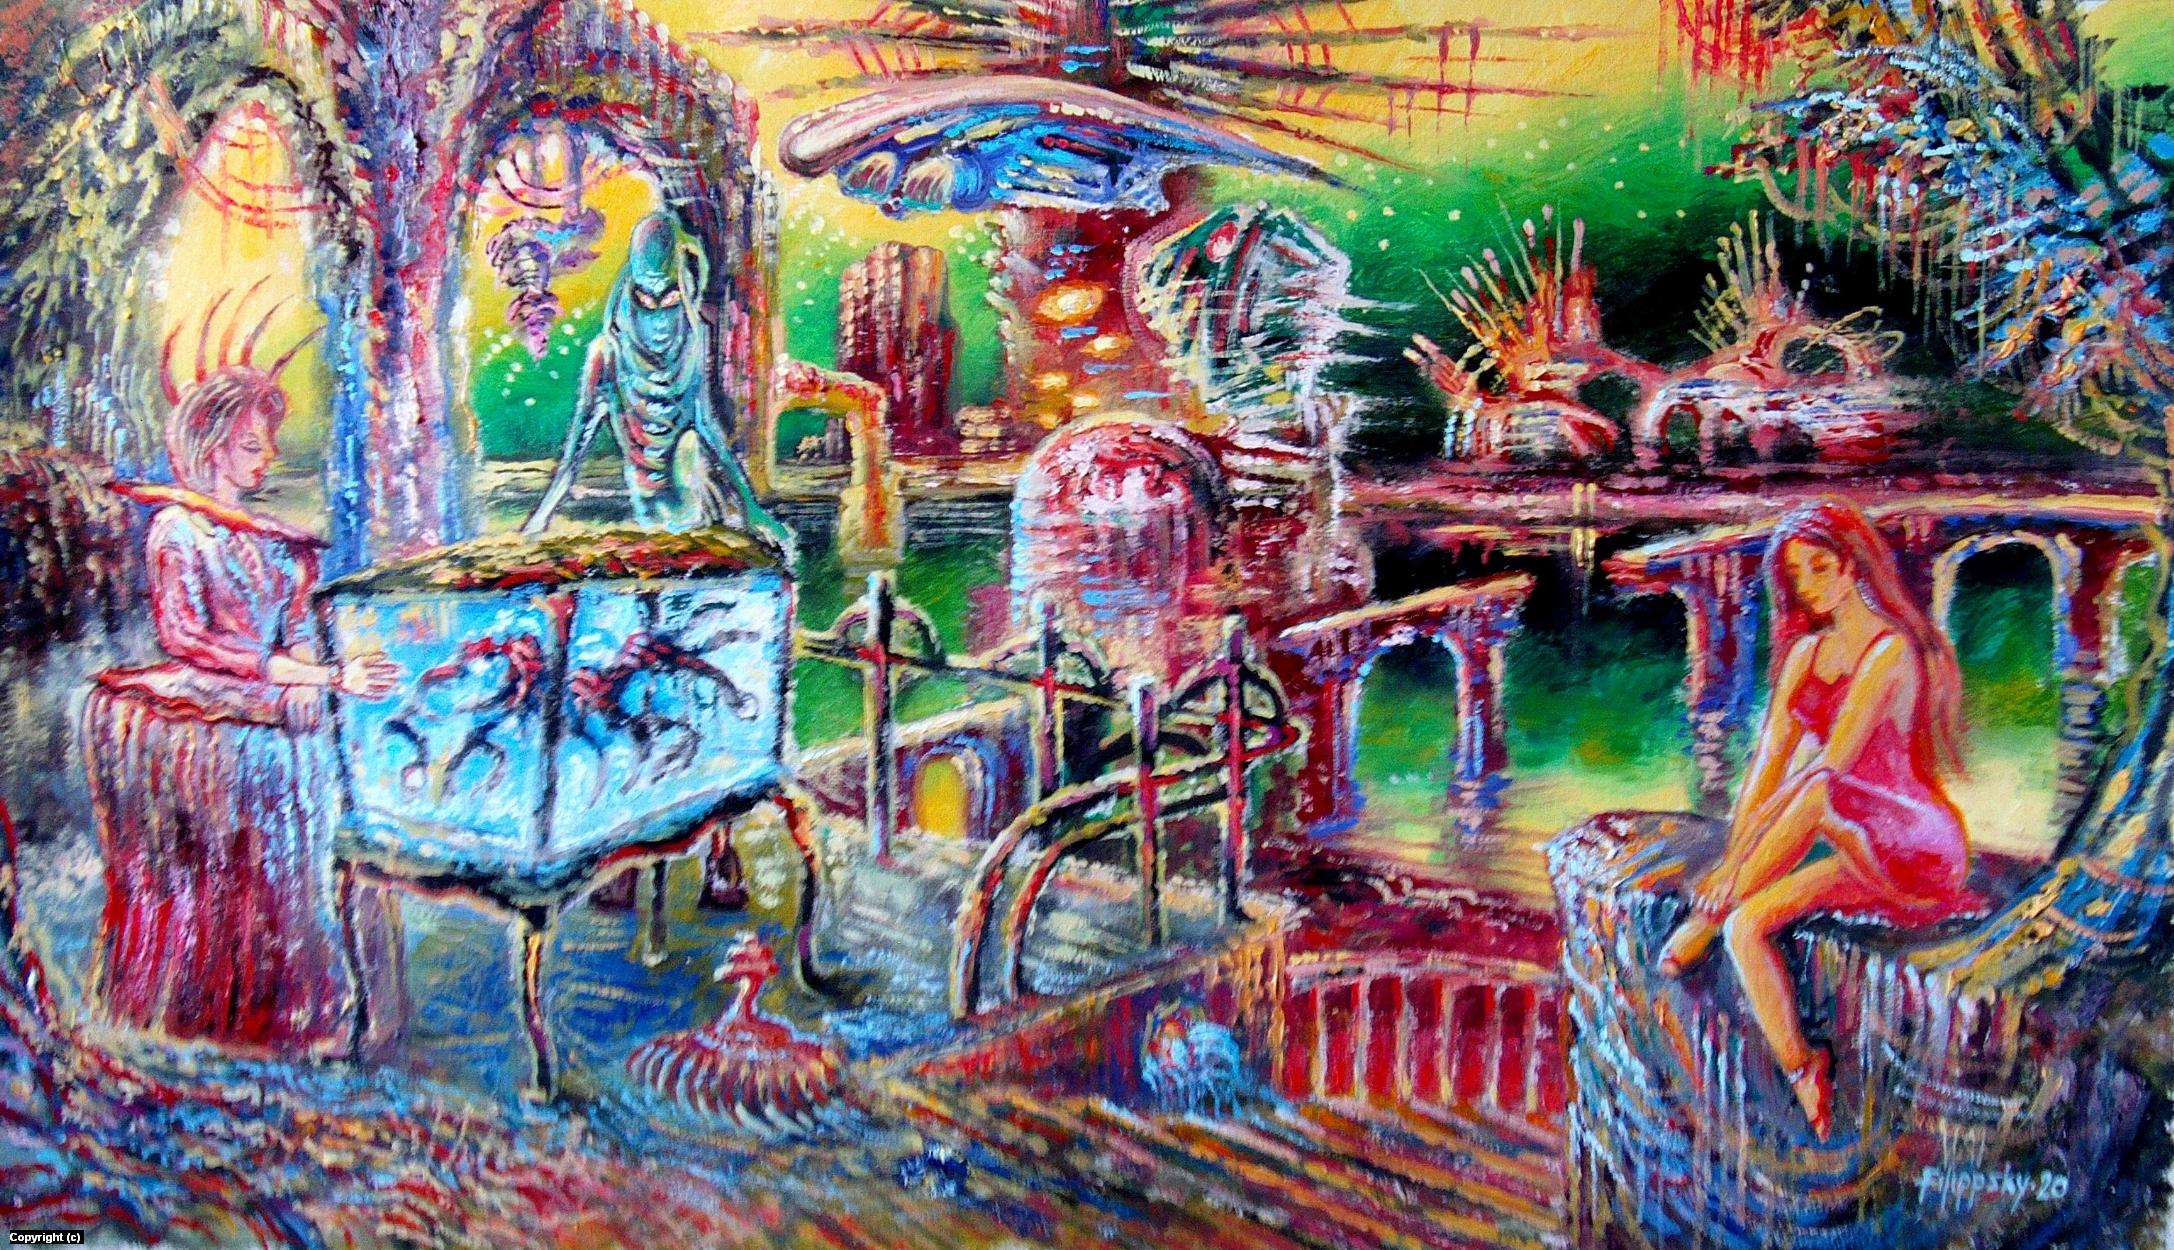 Aguarium. Artwork by Victor Filippsky